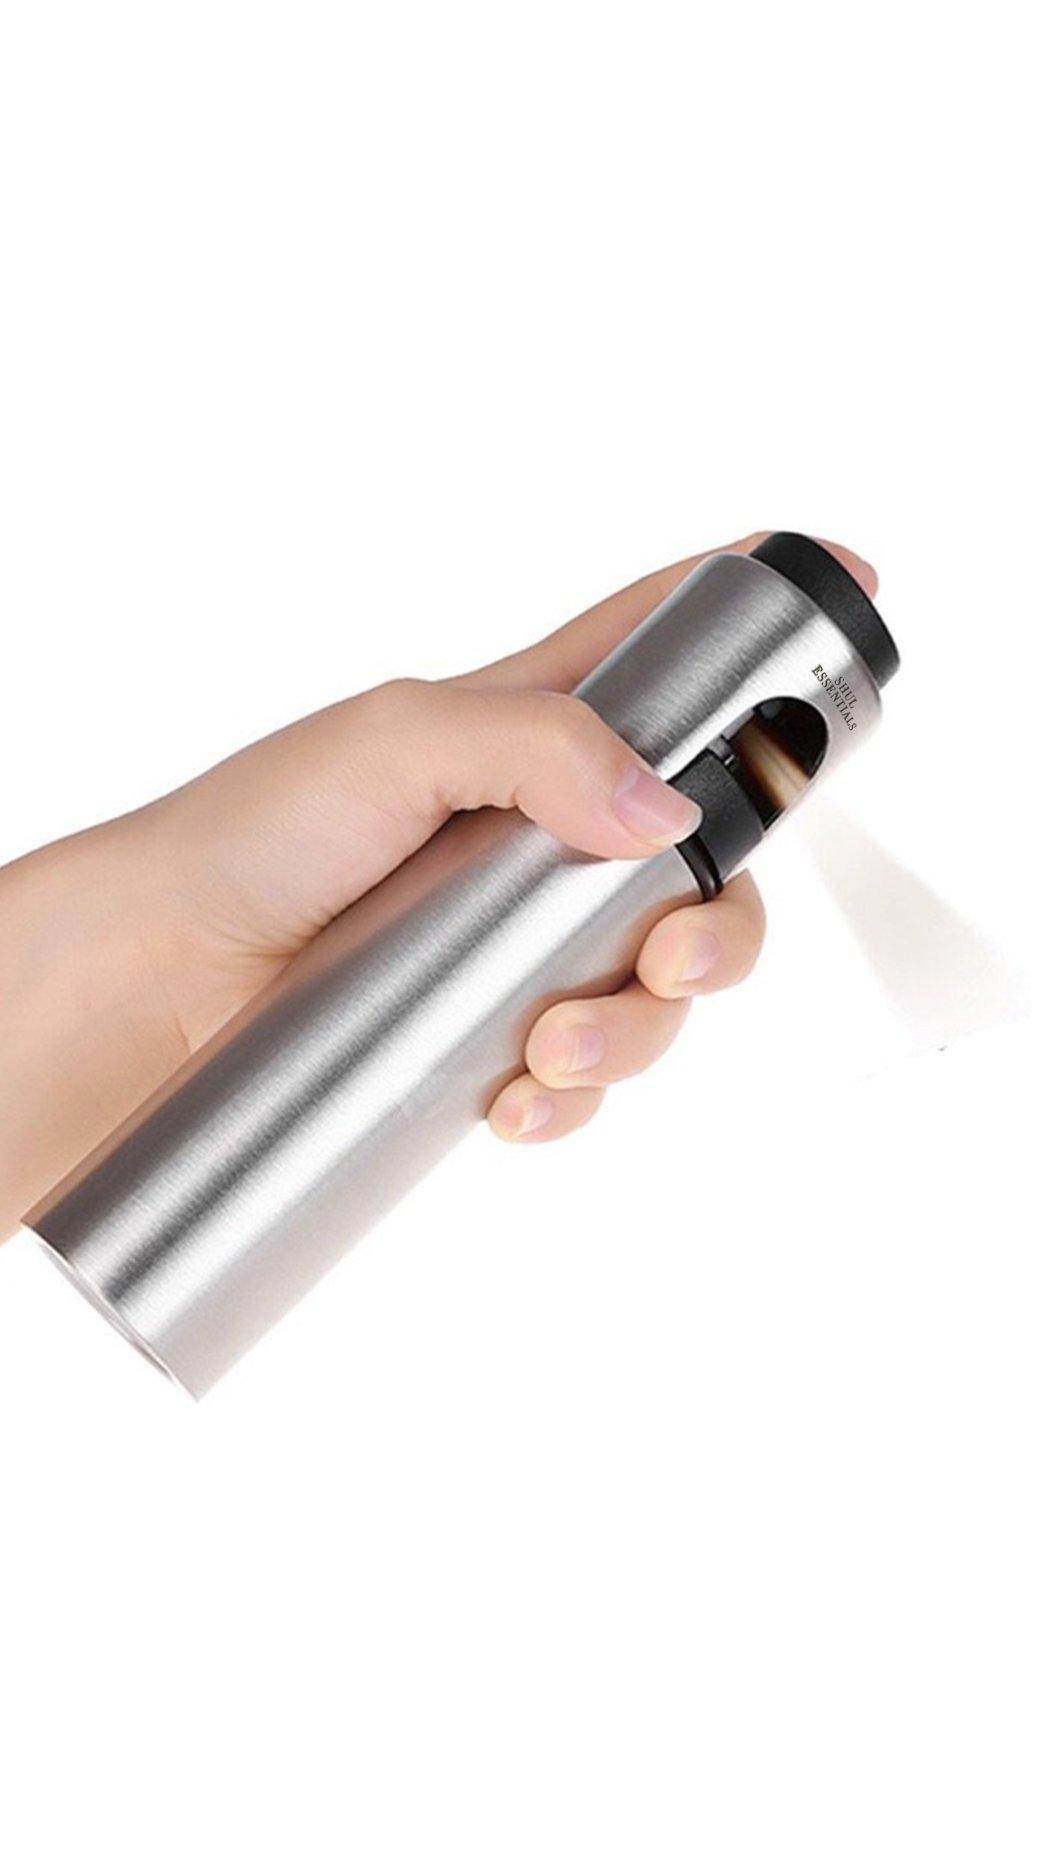 Shul Essentials Cooking Oil Sprayer for Kitchen, Grill/Pan Greaser, Salad Dressing Mister, Refill Olive Canola Vegetable Coconut Vinegar, NonAerosol Clog Free Pressure Pump Dispenser Stainless Steel